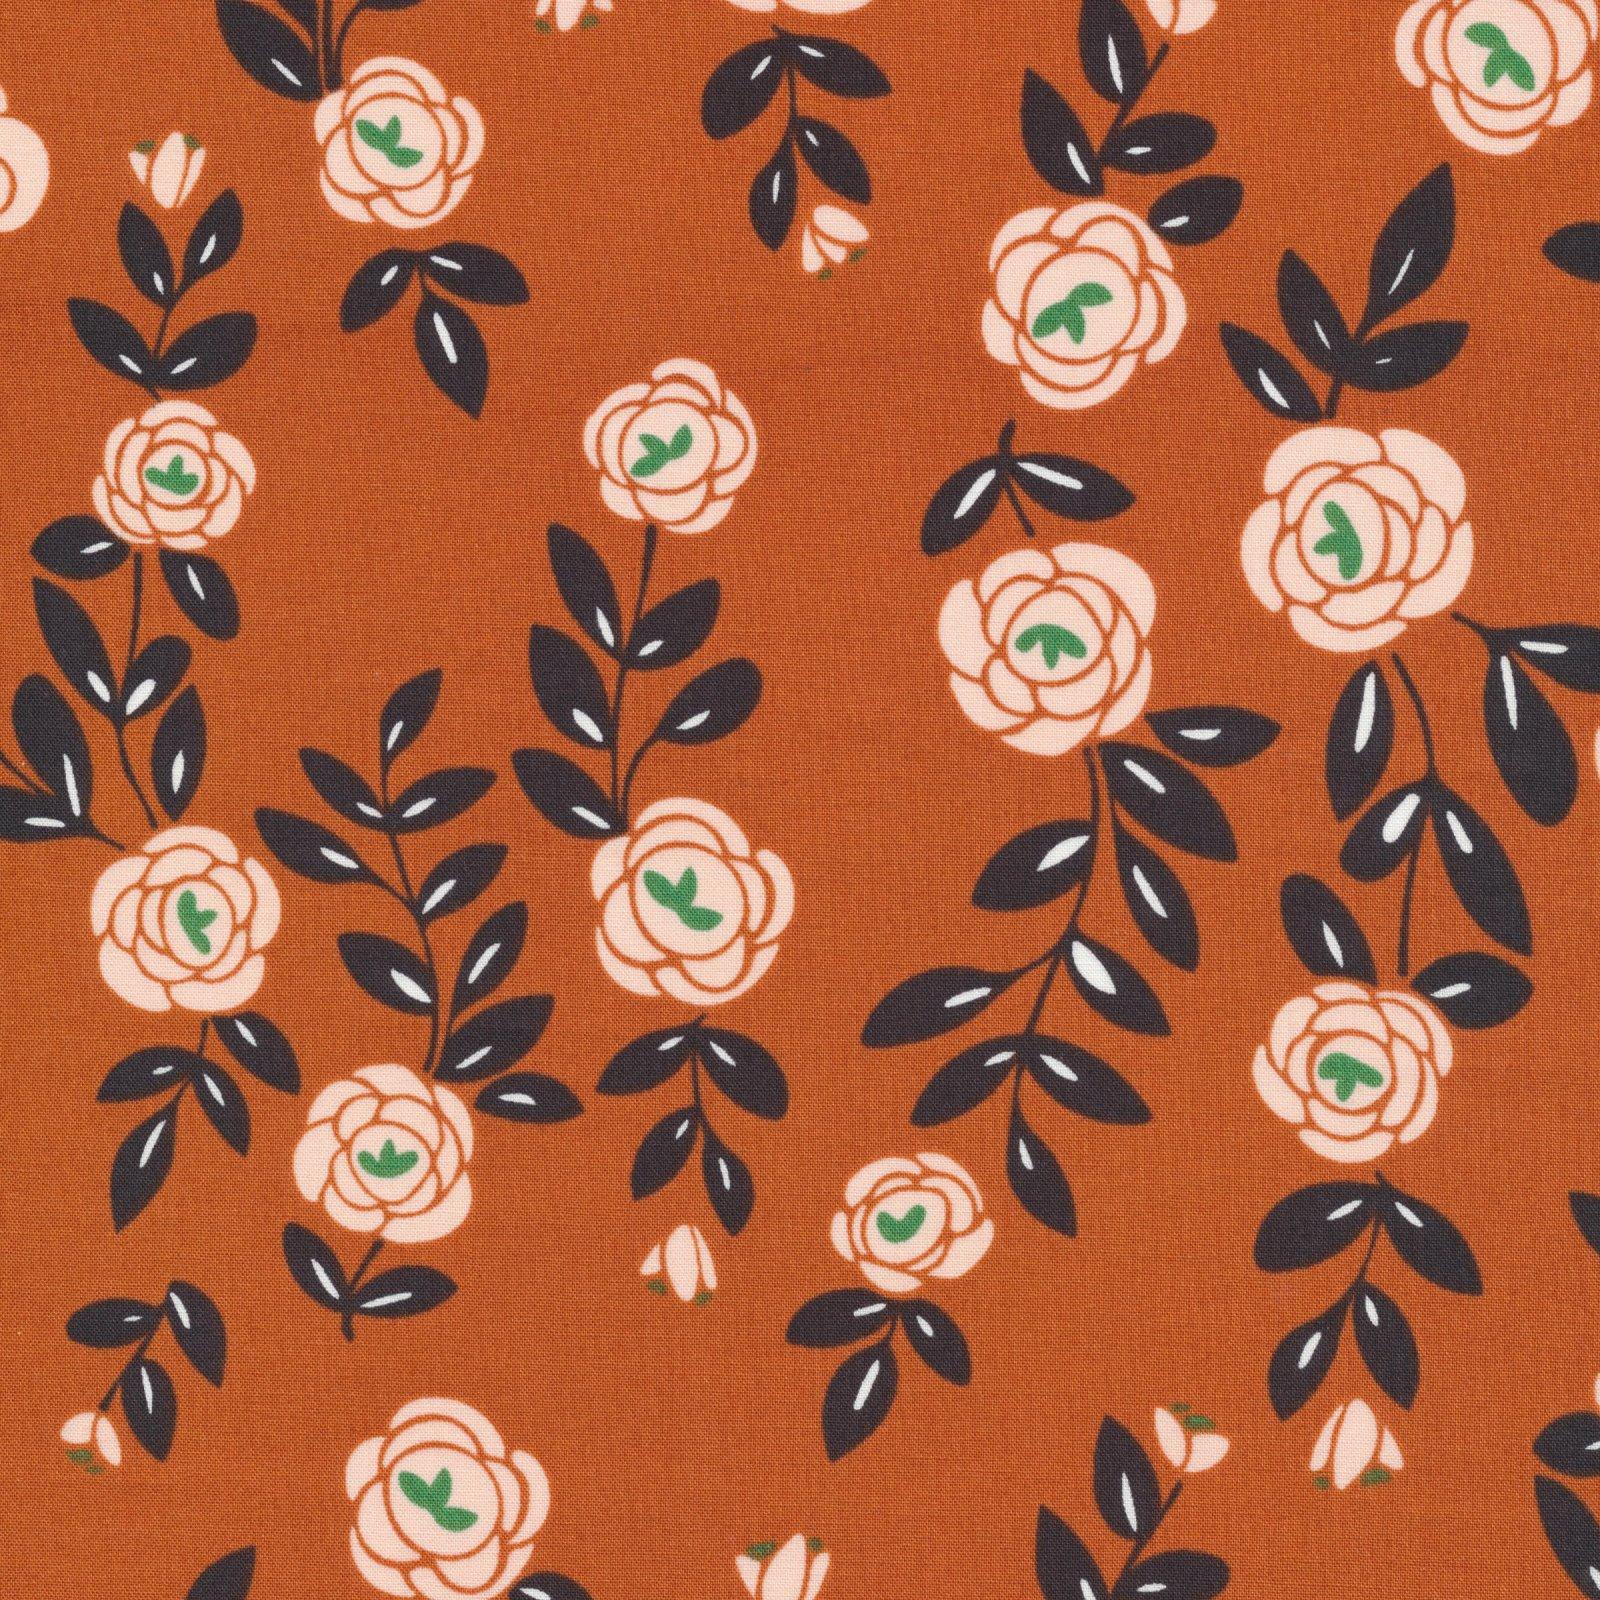 Rose Vines, Light Brick, Fanciful